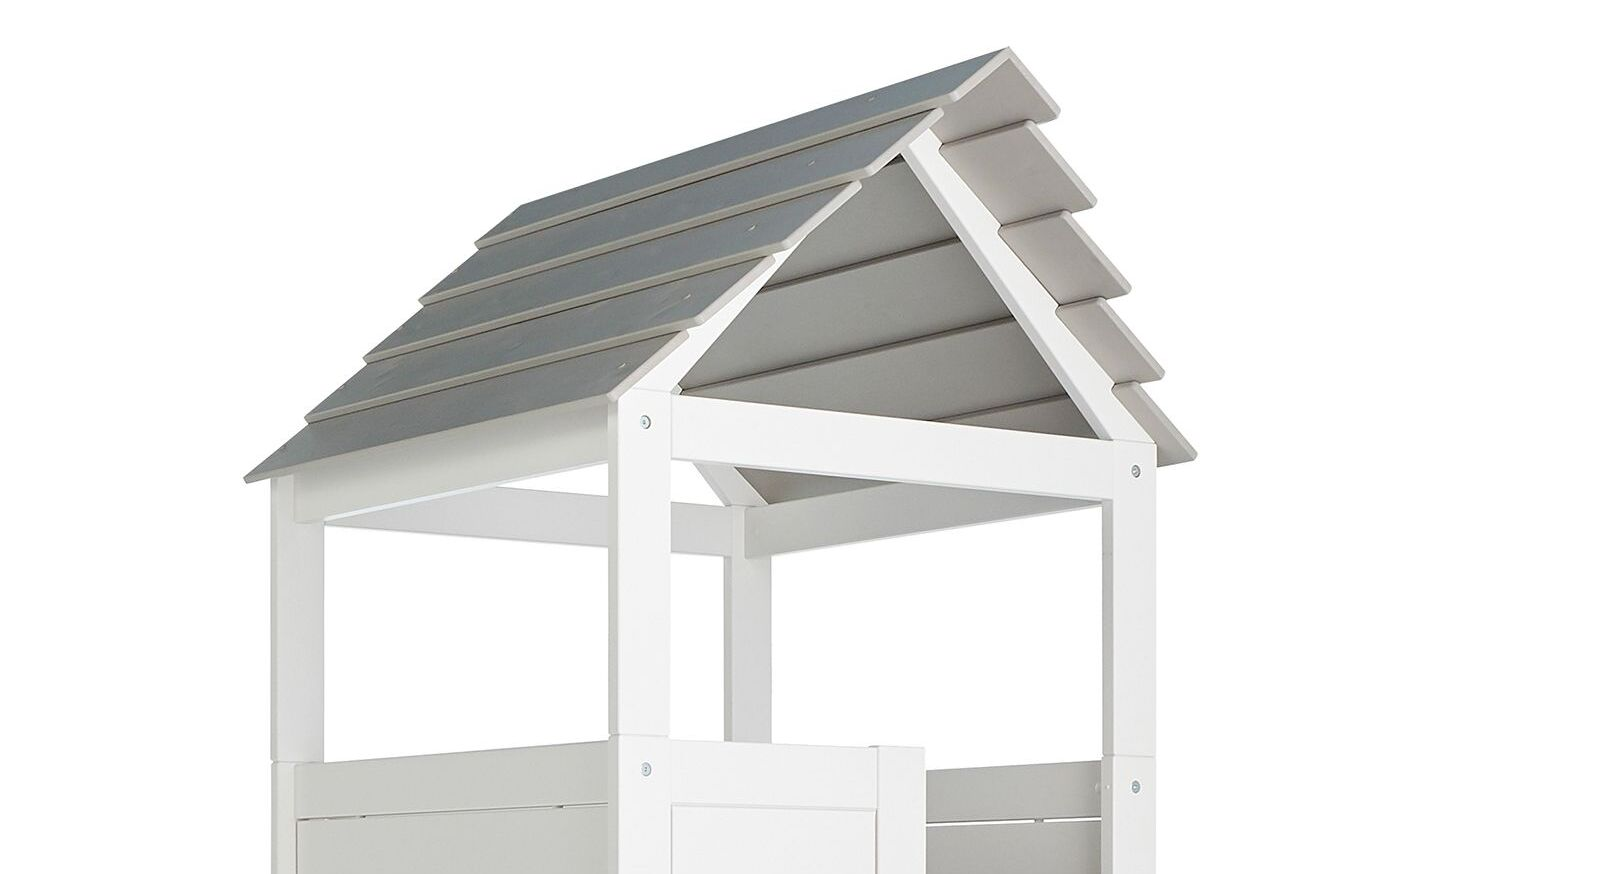 LIFETIME Kinderbett Play Tower mit grauem Dach